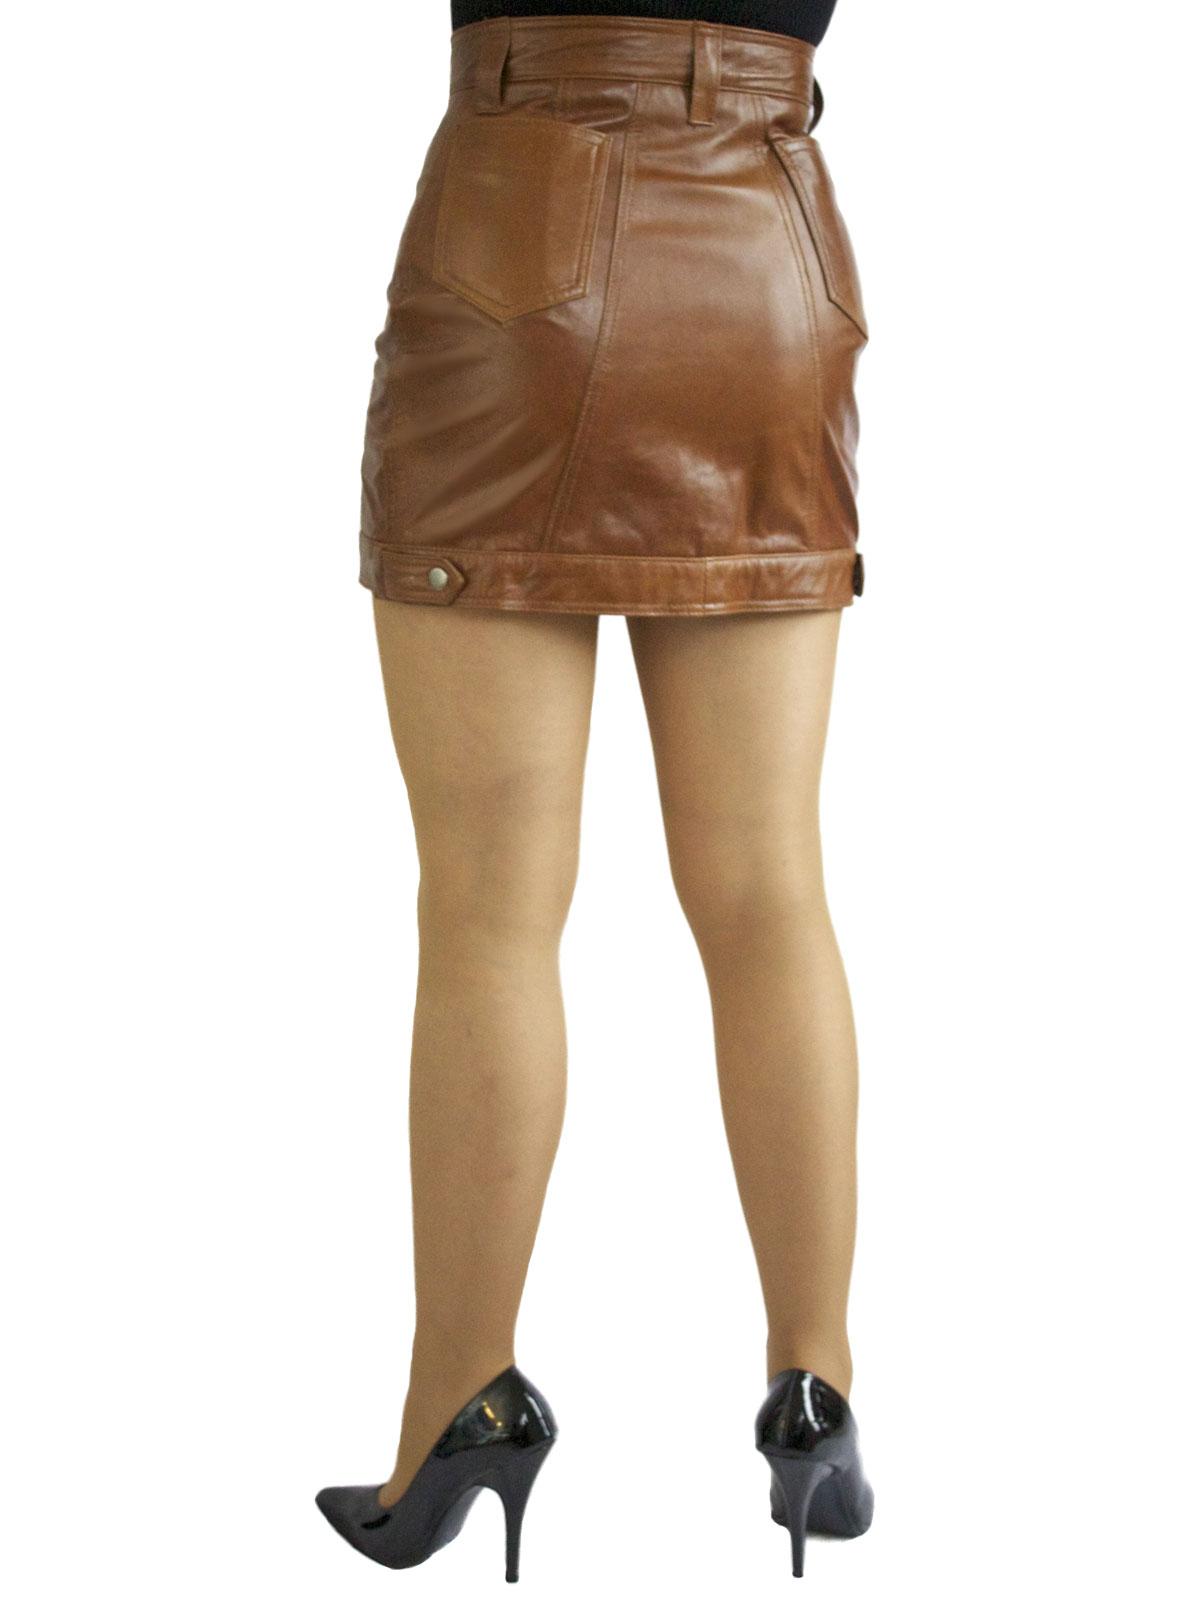 Leather Mini Skirt Front Stud Opening Tout Ensemble